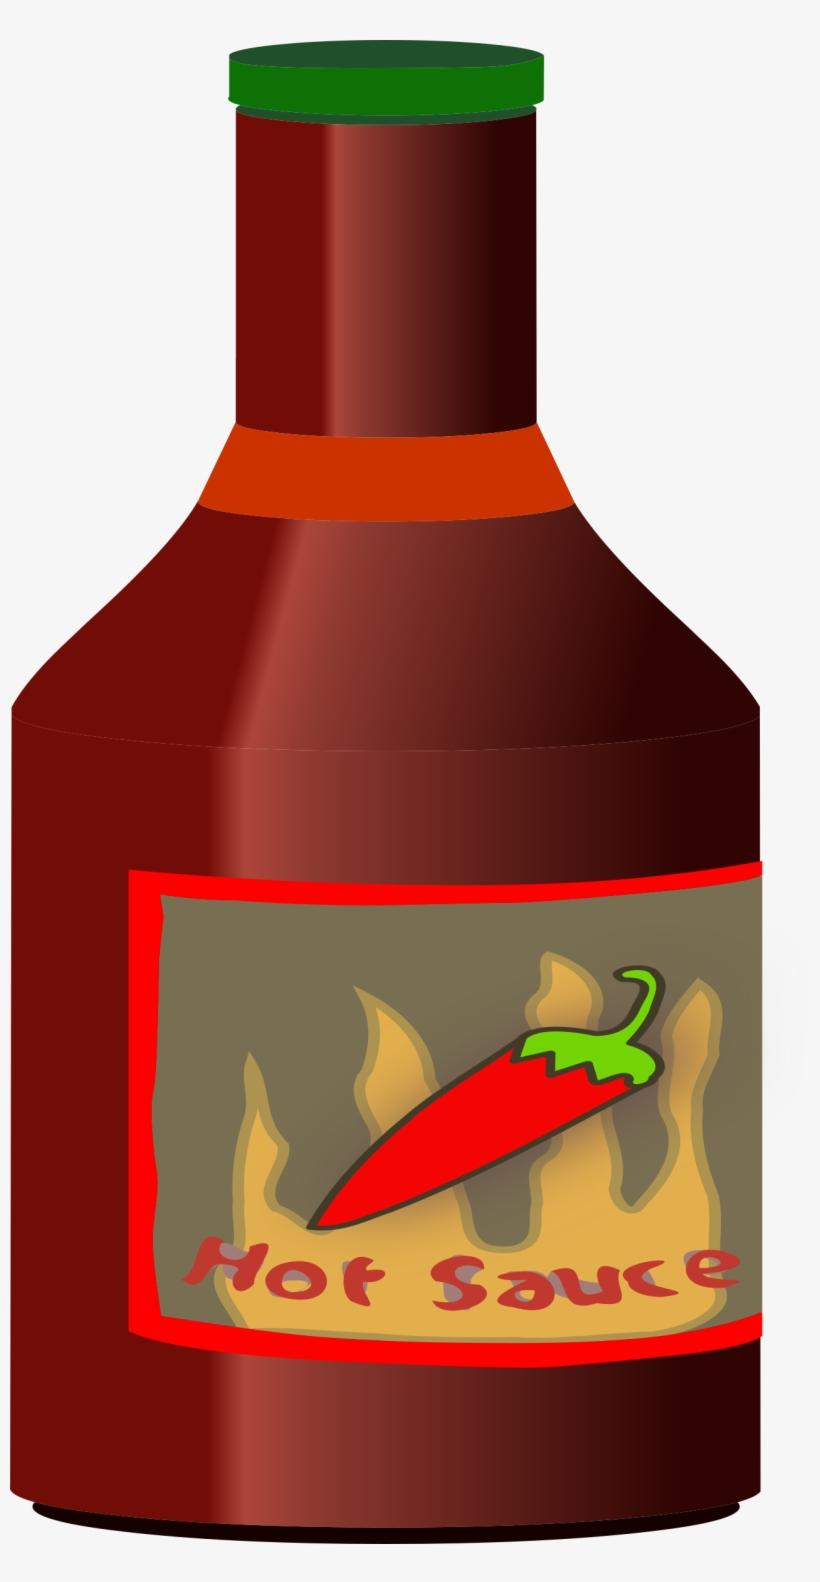 820x1582 Chili Drawing Hot Sauce